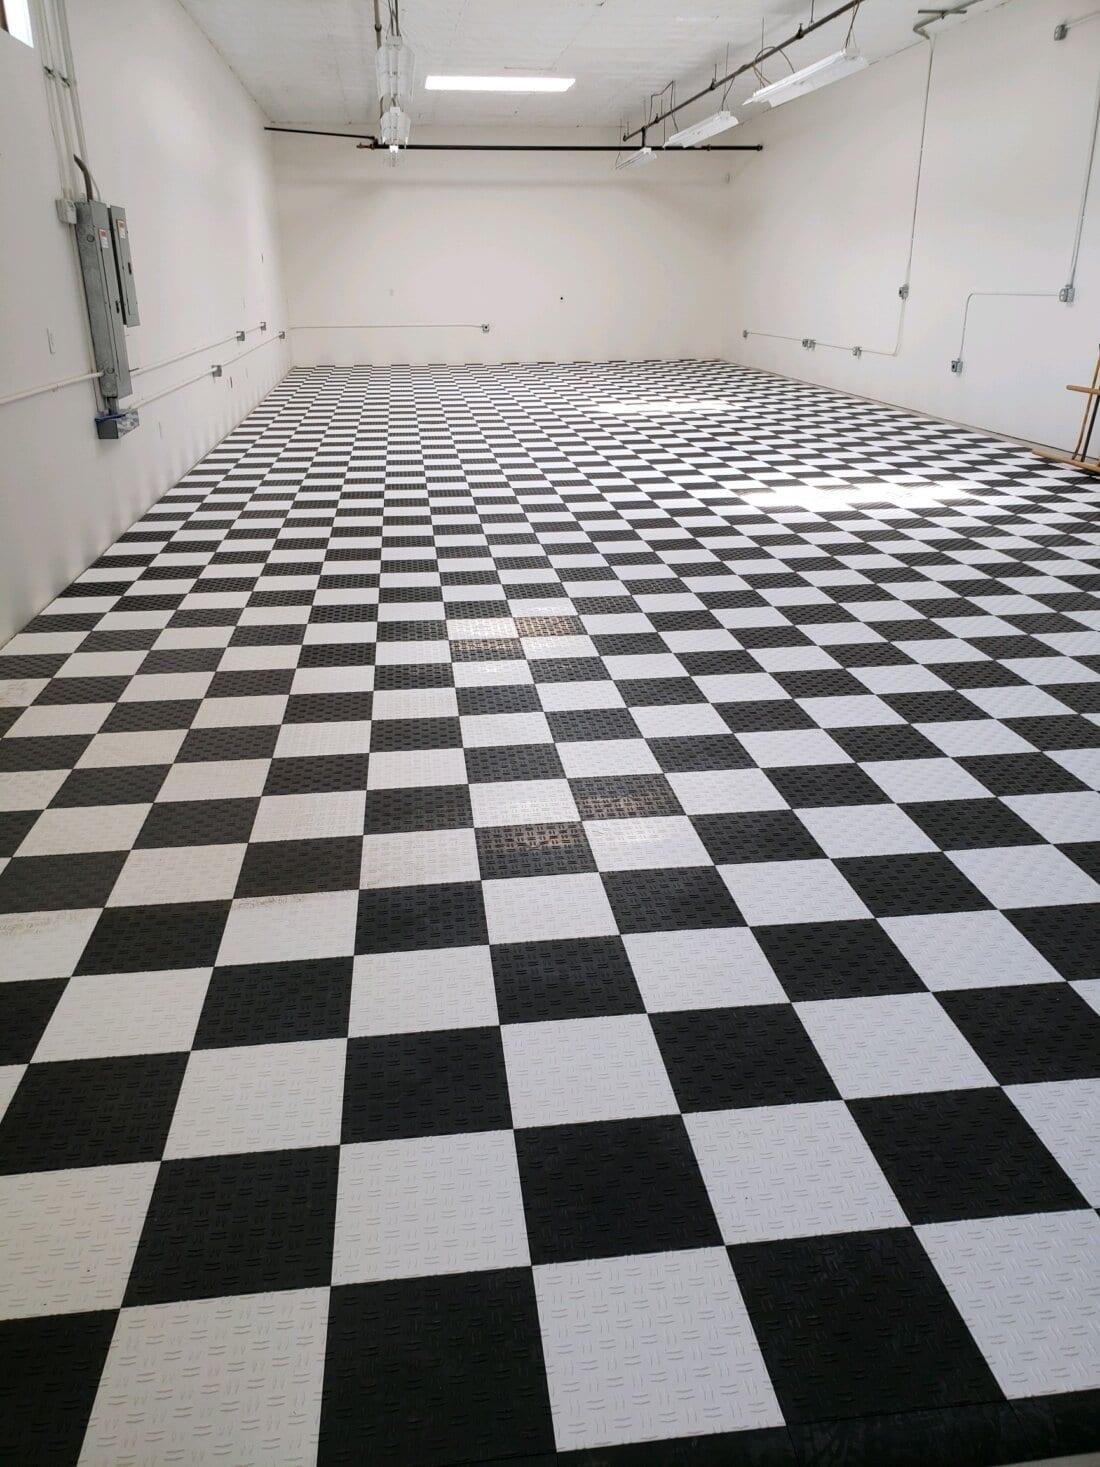 Checkerboard Diamond Pattern Tiles